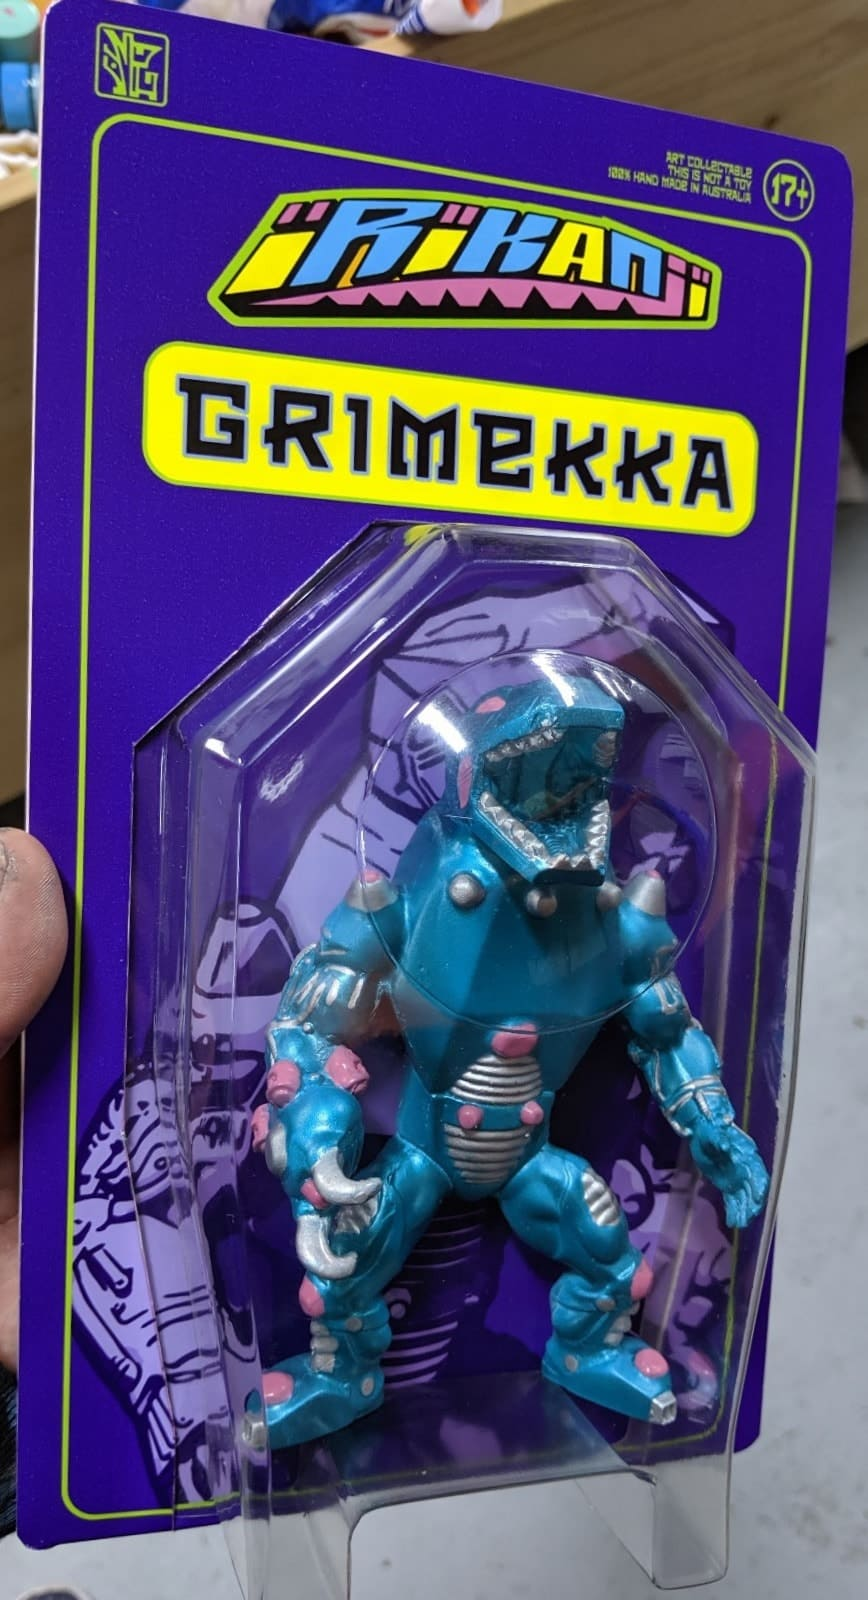 Grimekka Carded Irikanji Facter Resin Art Toy